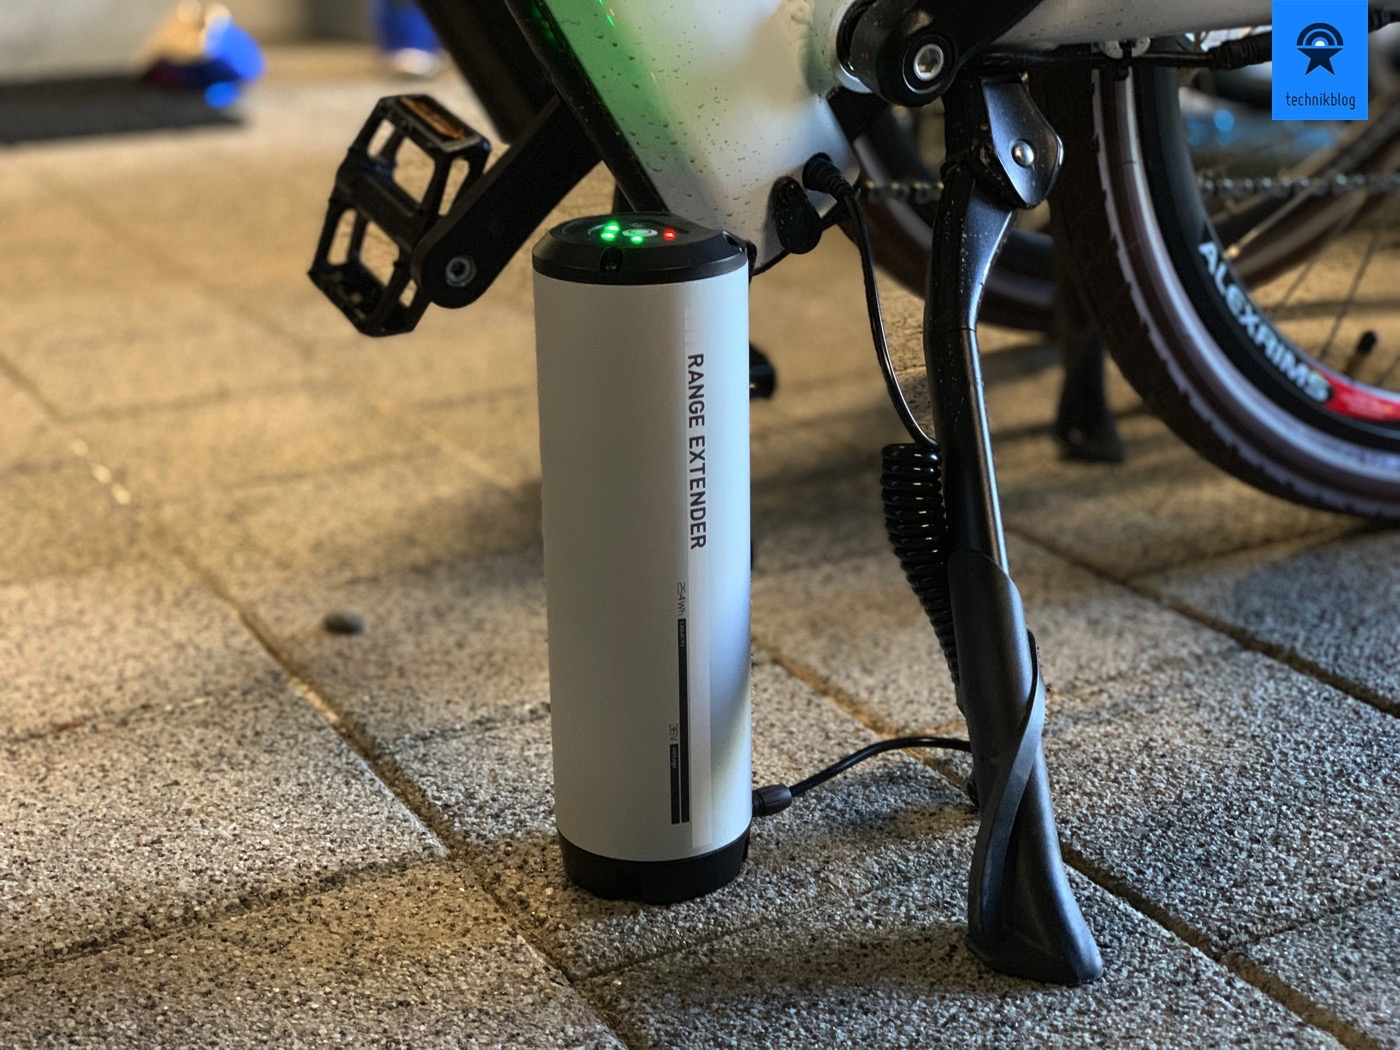 e-Bike Range Extender im Einsatz